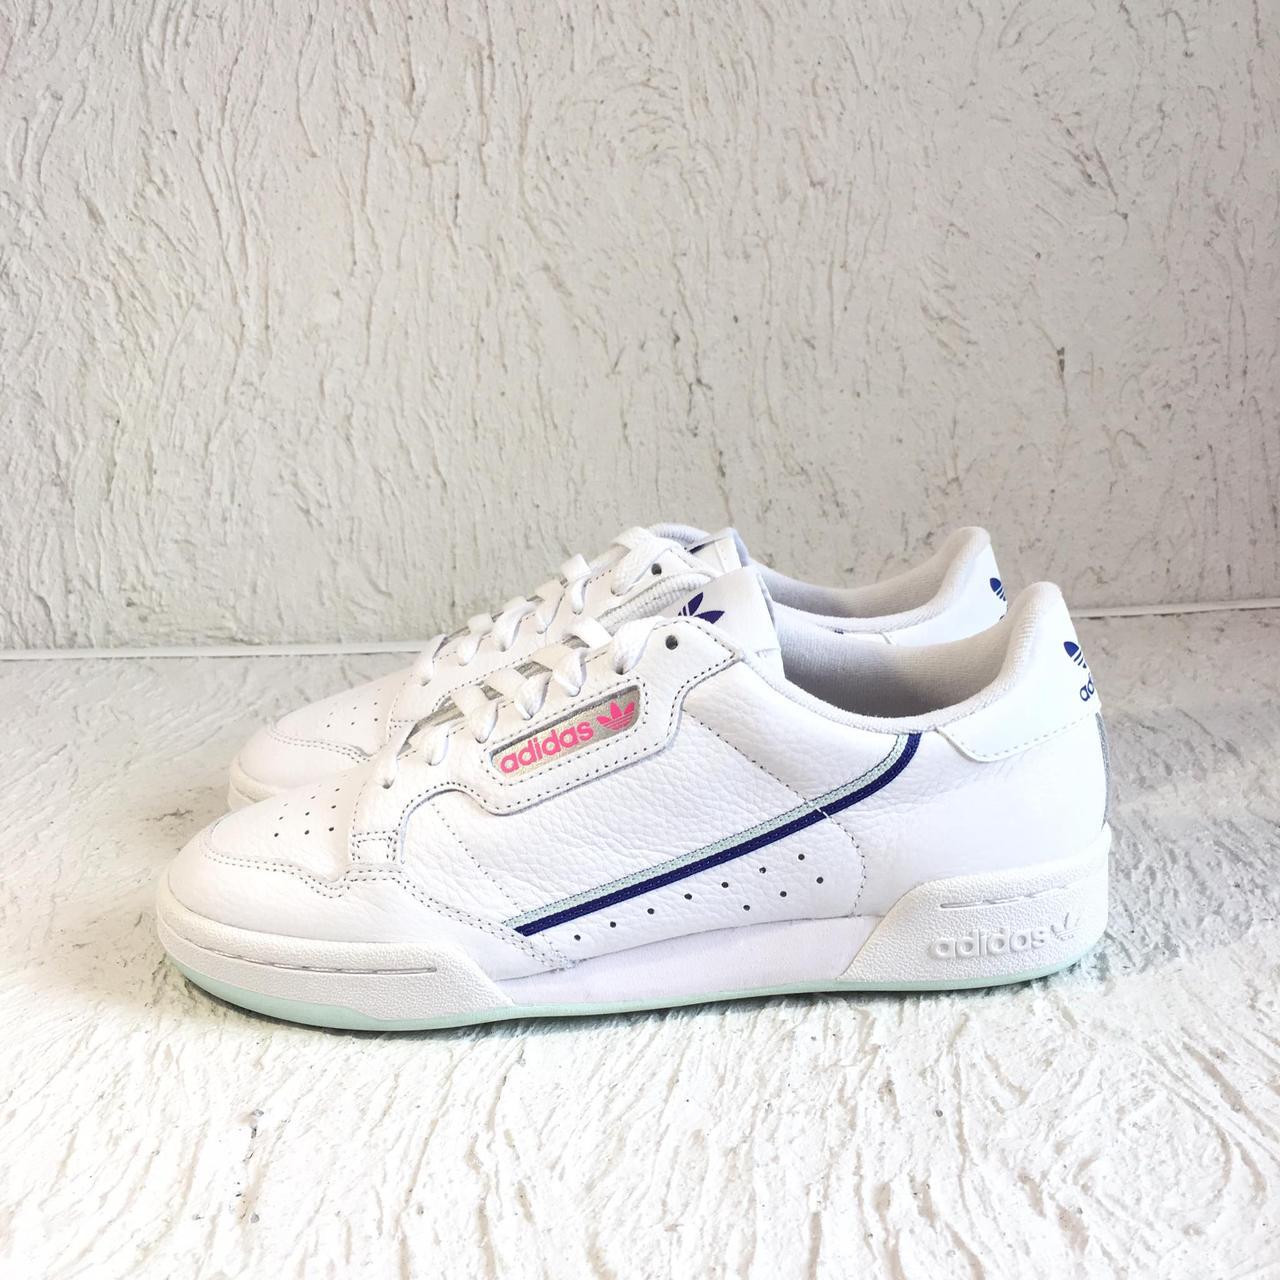 Кроссовки Adidas Continental 80 G27725 38.5, 40.5 размер